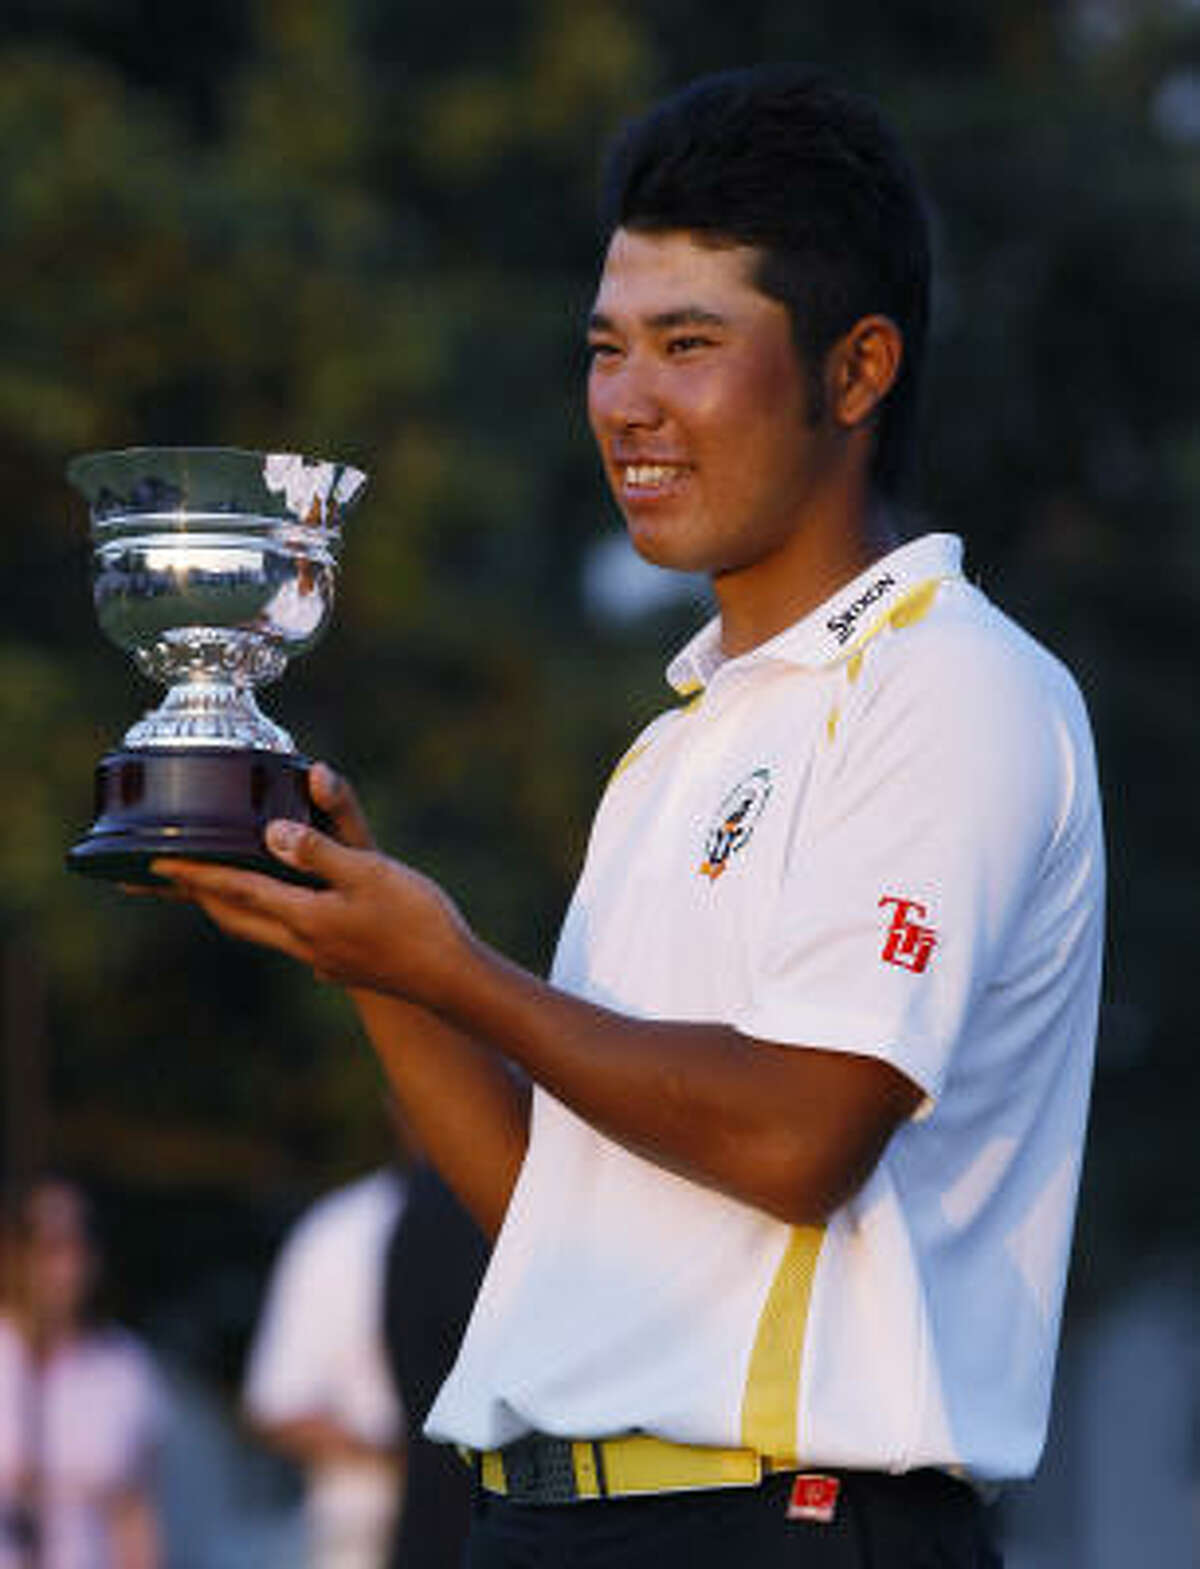 Hideki Matsuyama of Japan holds his amateur championship trophy.